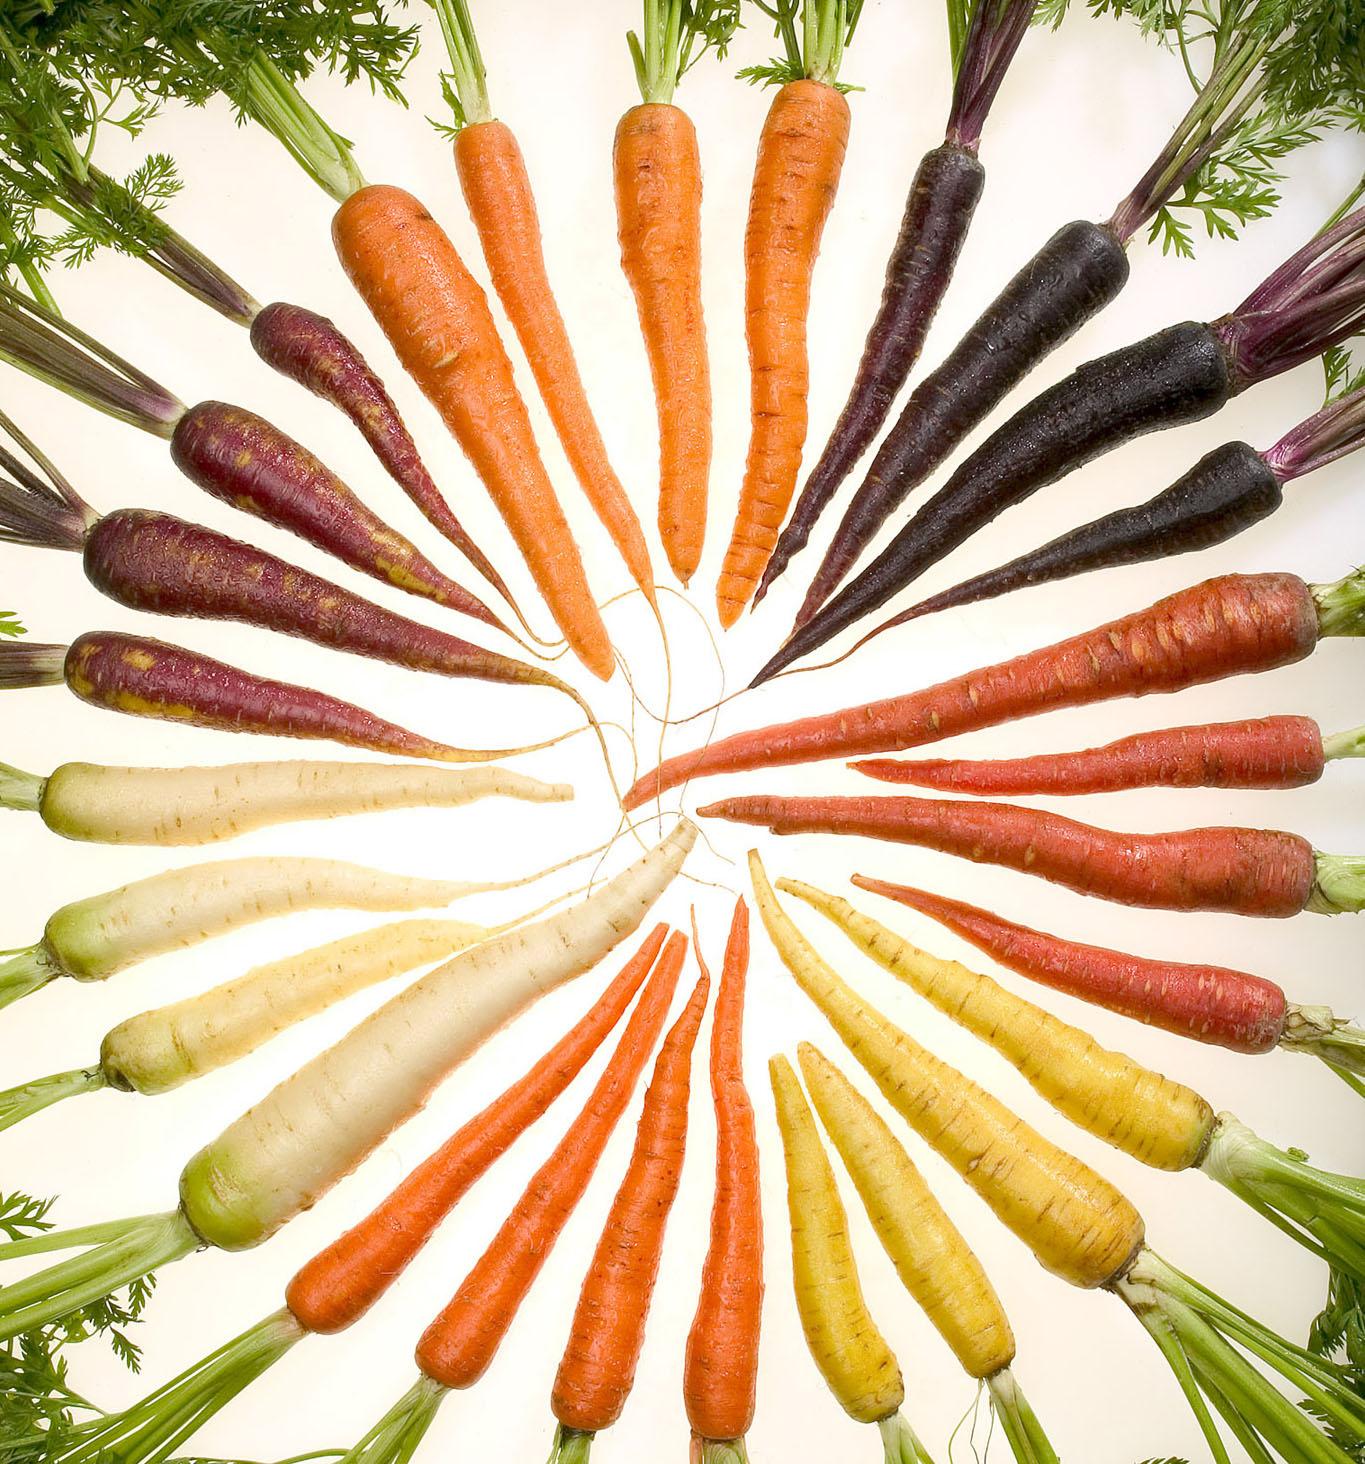 Carrots_of_many_colors_cutout